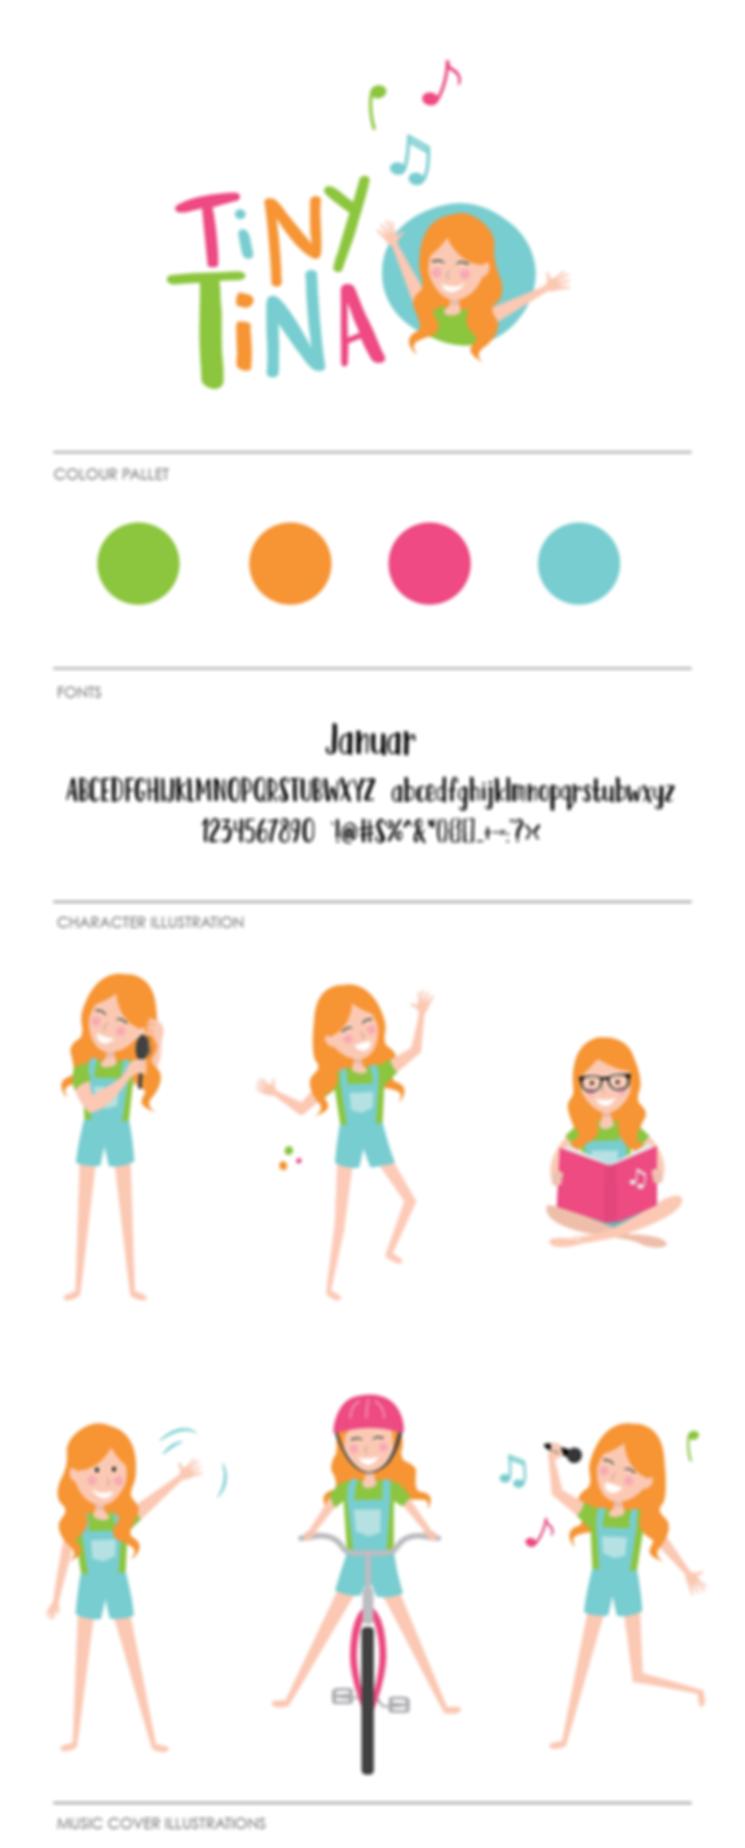 Tiny-Tina-Branding-Illustration.png